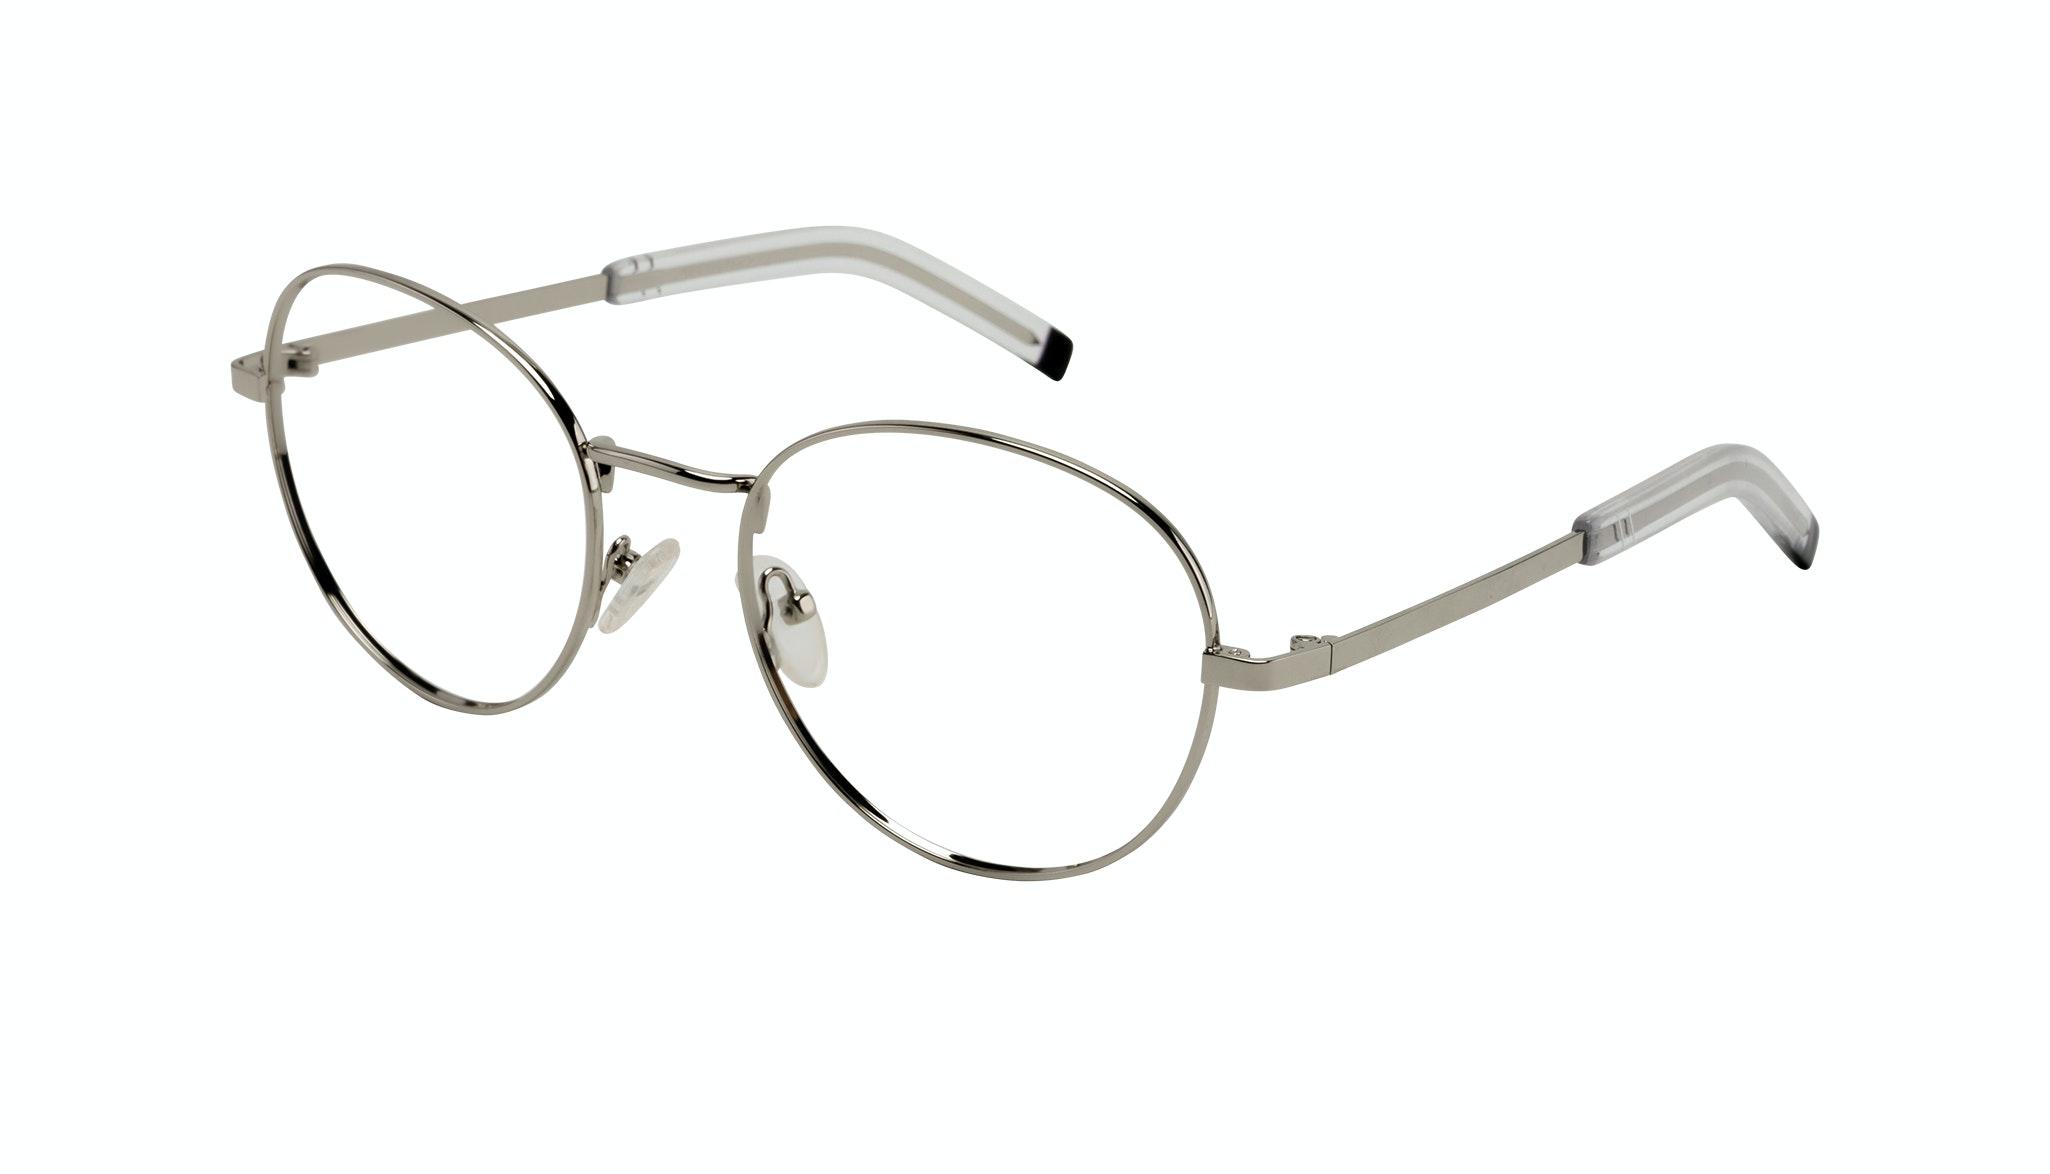 Affordable Fashion Glasses Round Eyeglasses Men Lean XL Silver Tilt